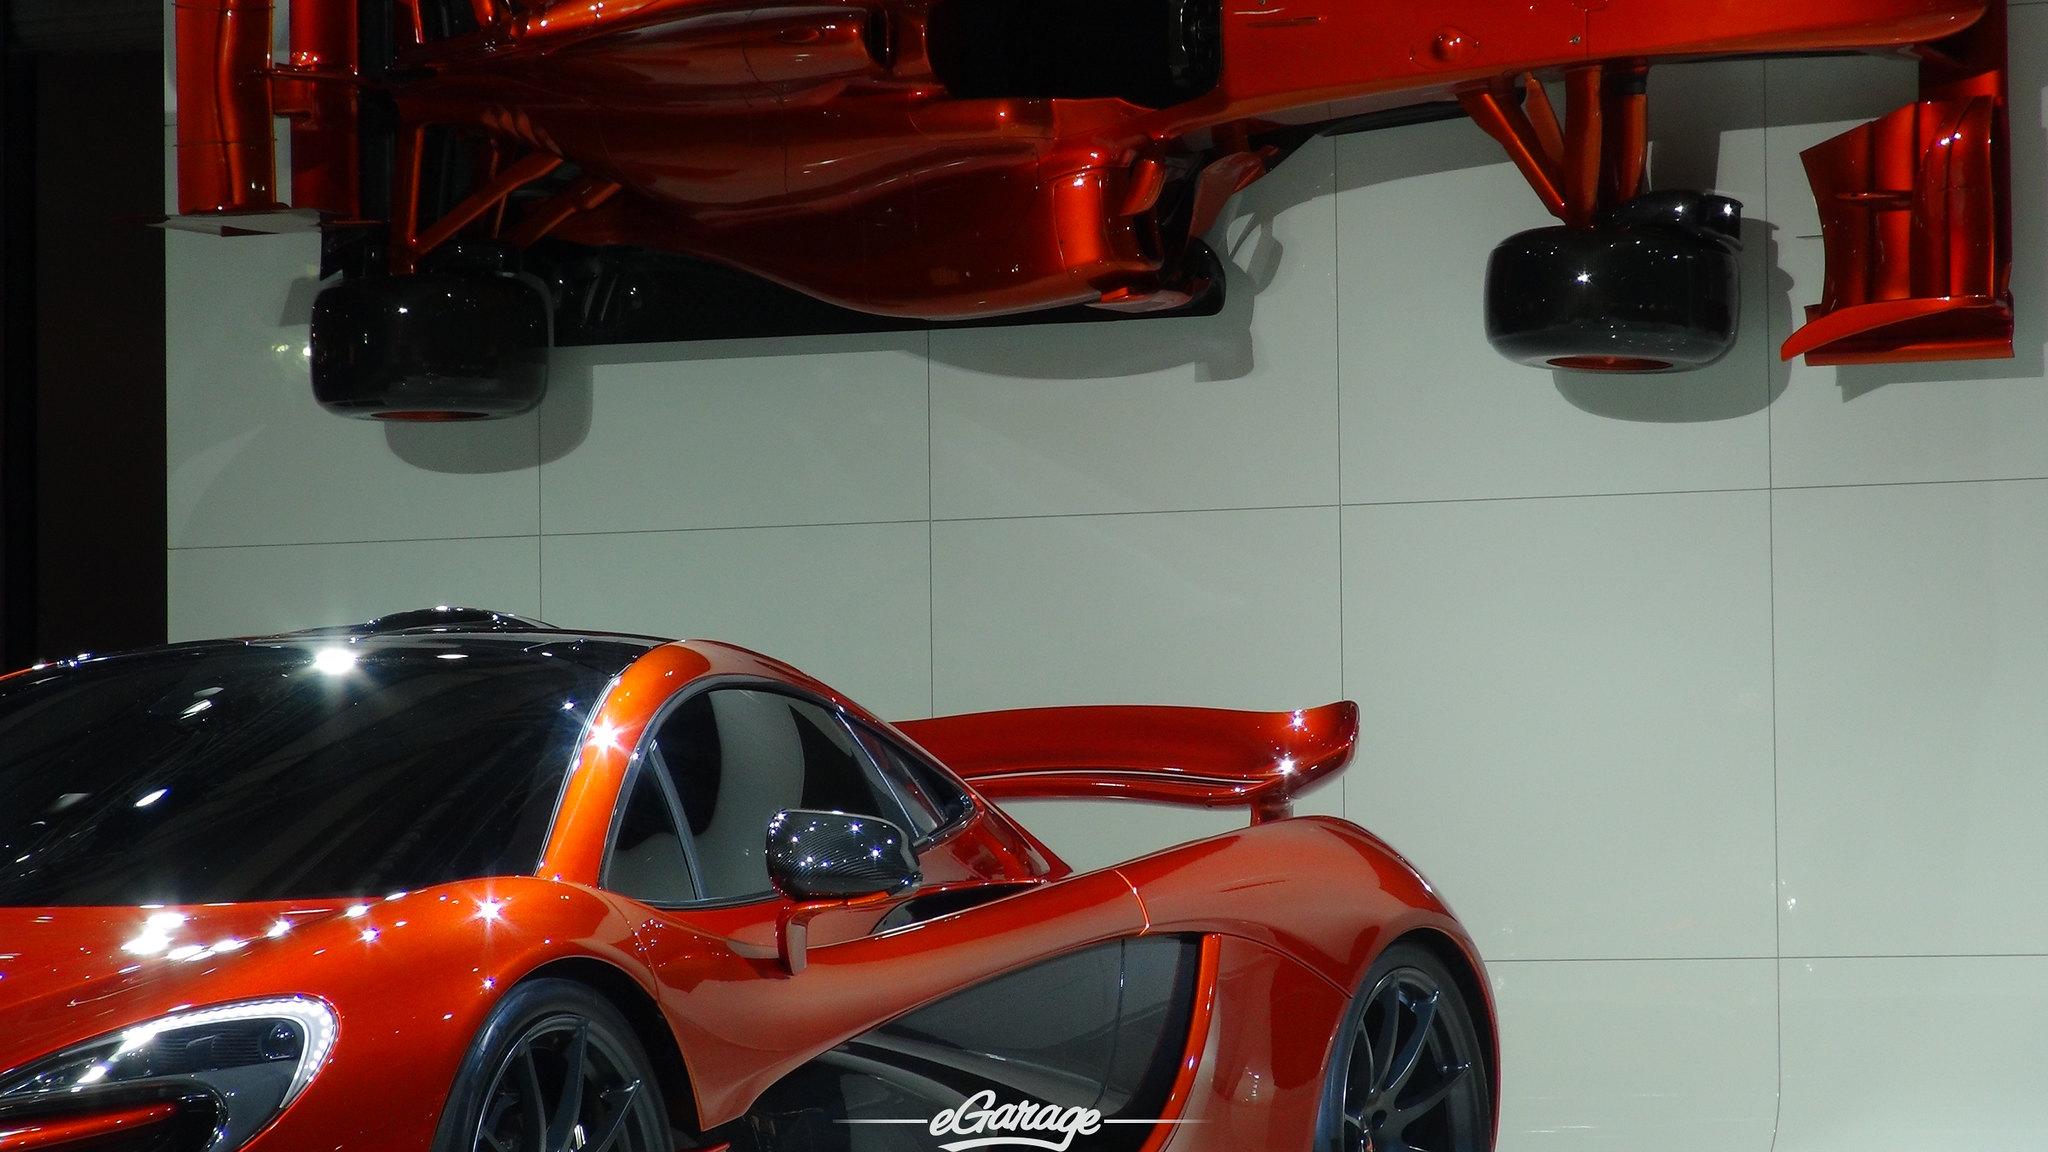 8034742473 c5a120afa3 k 2012 Paris Motor Show